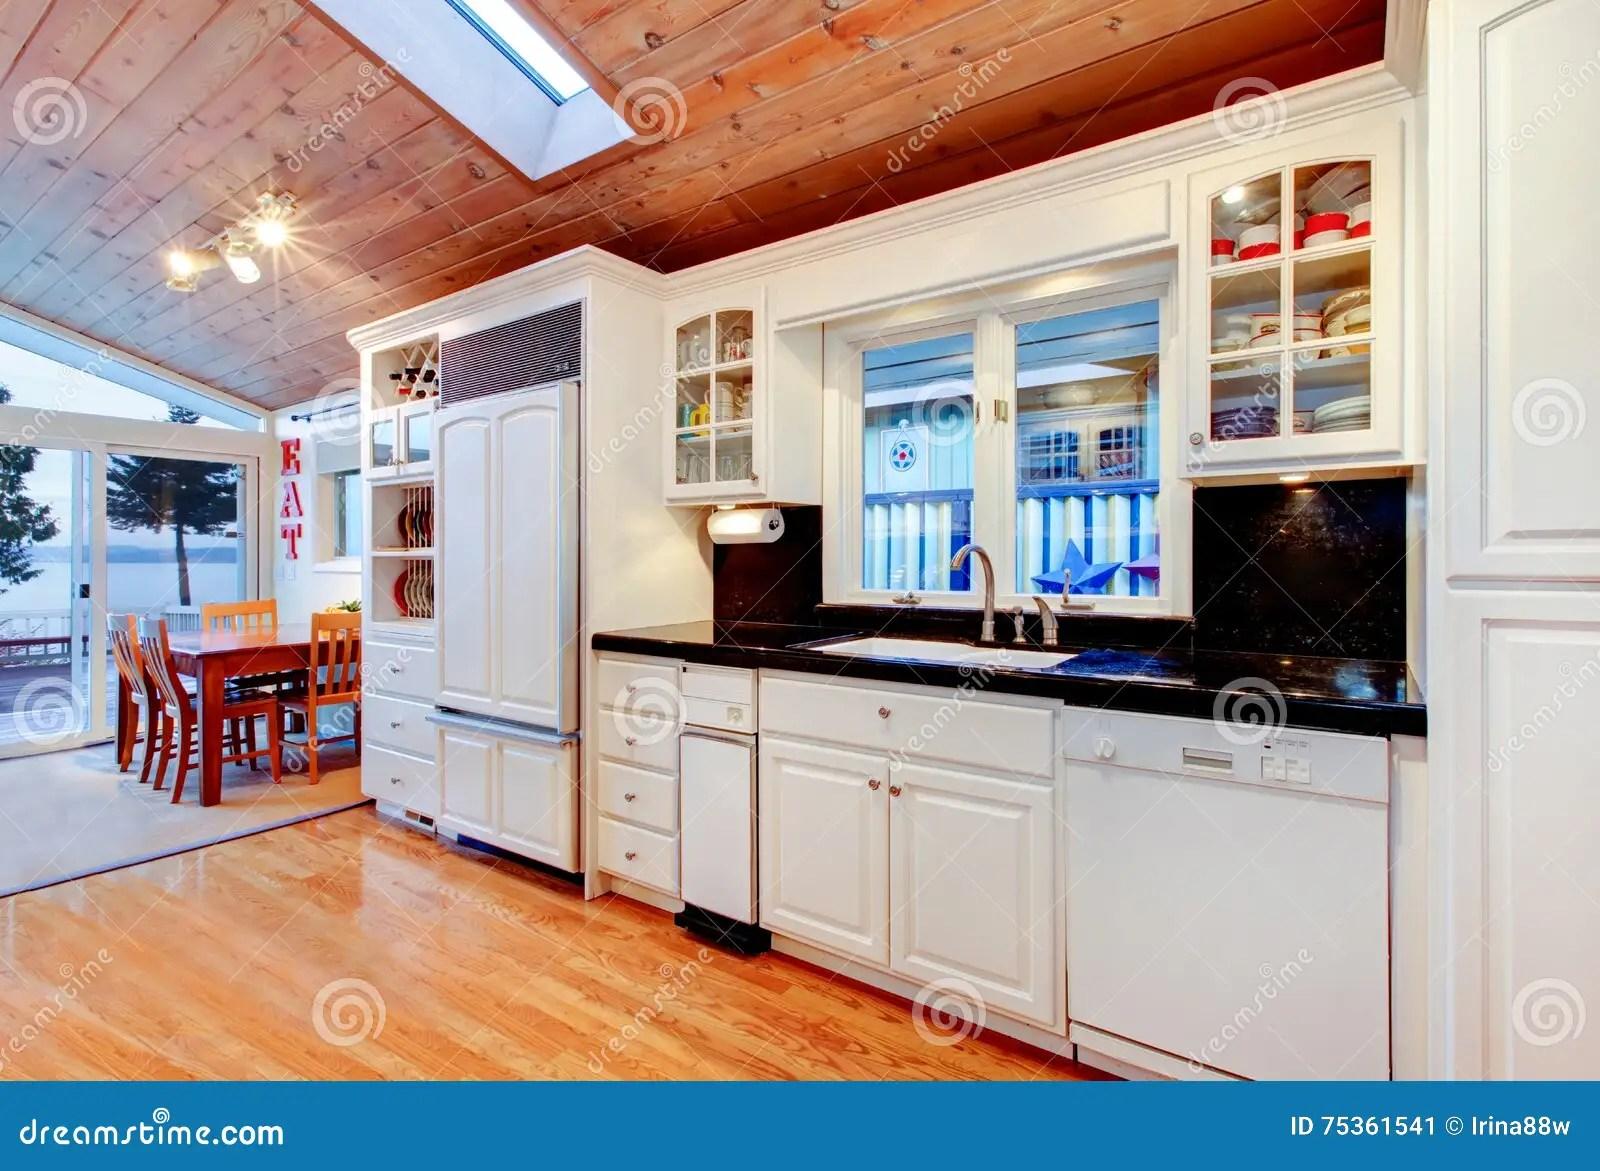 kitchen cabinets ri stick on backsplash tiles for 有黑桌面的白色厨柜在豪华房子里库存图片 图片包括有水槽 厨房 拱道 有黑桌面 发光的硬木地板和木天花板的白色厨柜与在豪华房子内部的天窗西北 美国